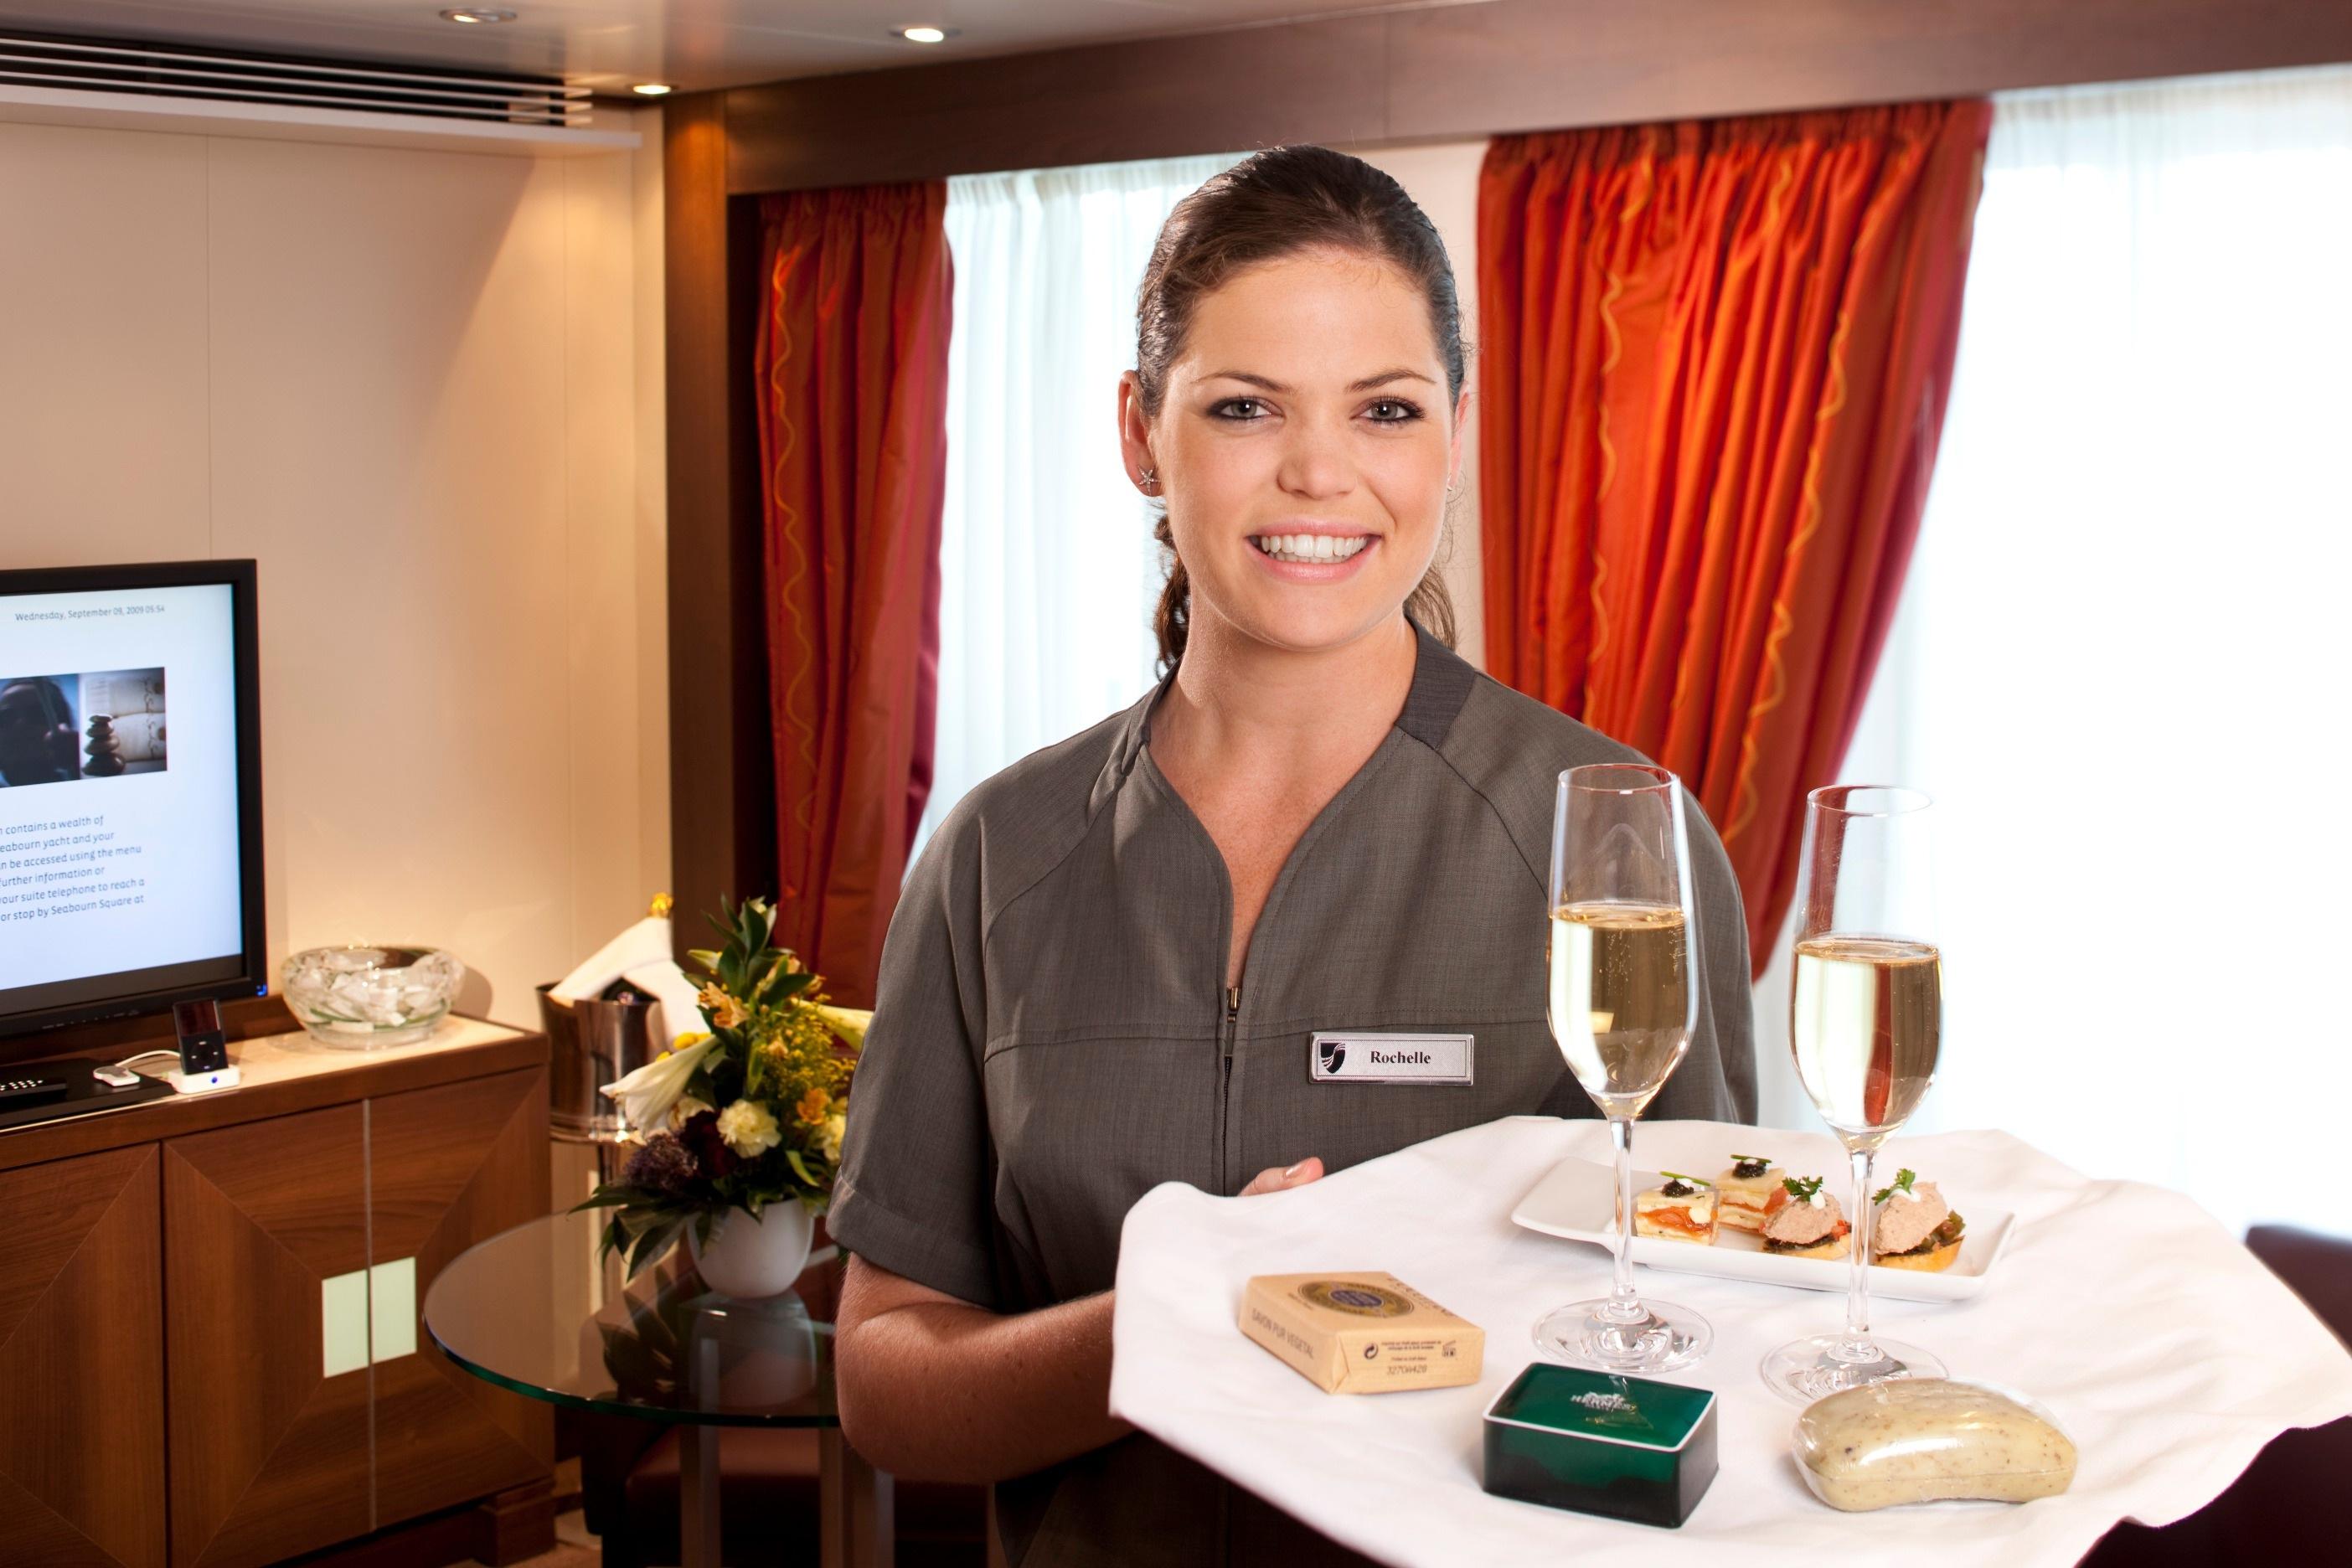 Seabourn Personal Suite Stewardess.jpg